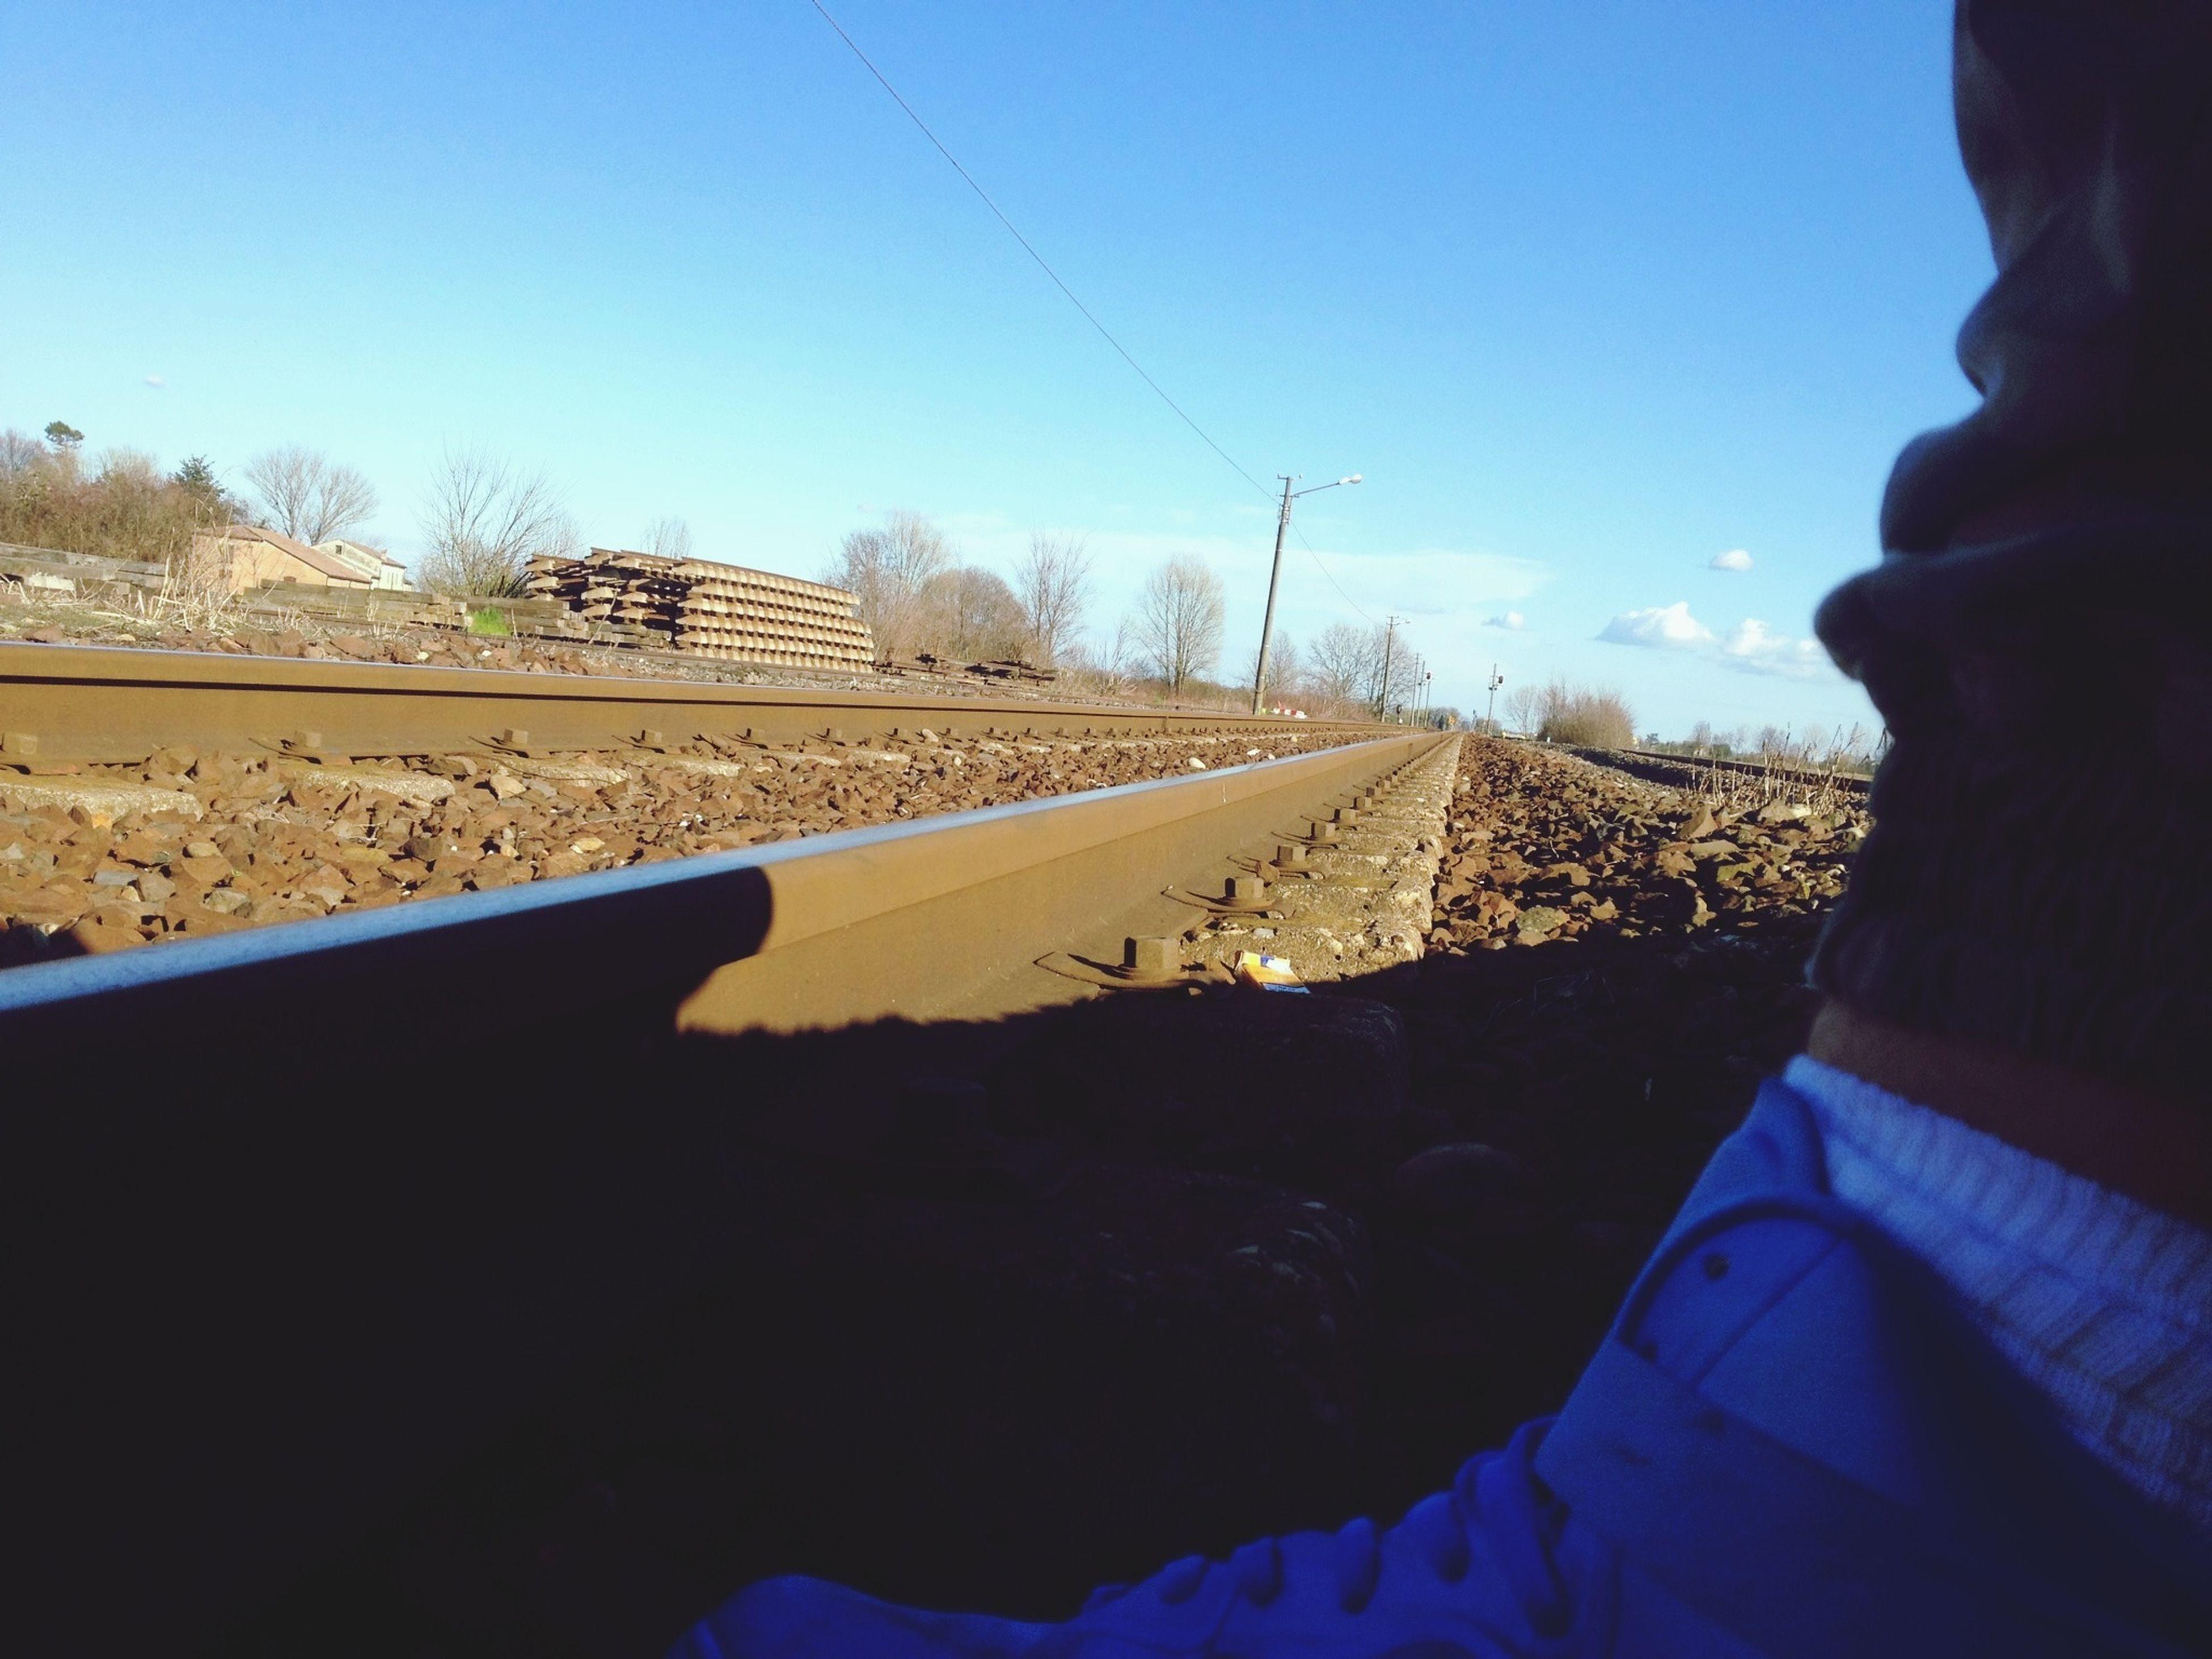 railroad track, transportation, clear sky, blue, sky, rail transportation, tree, diminishing perspective, the way forward, vanishing point, travel, day, public transportation, men, journey, railway track, copy space, outdoors